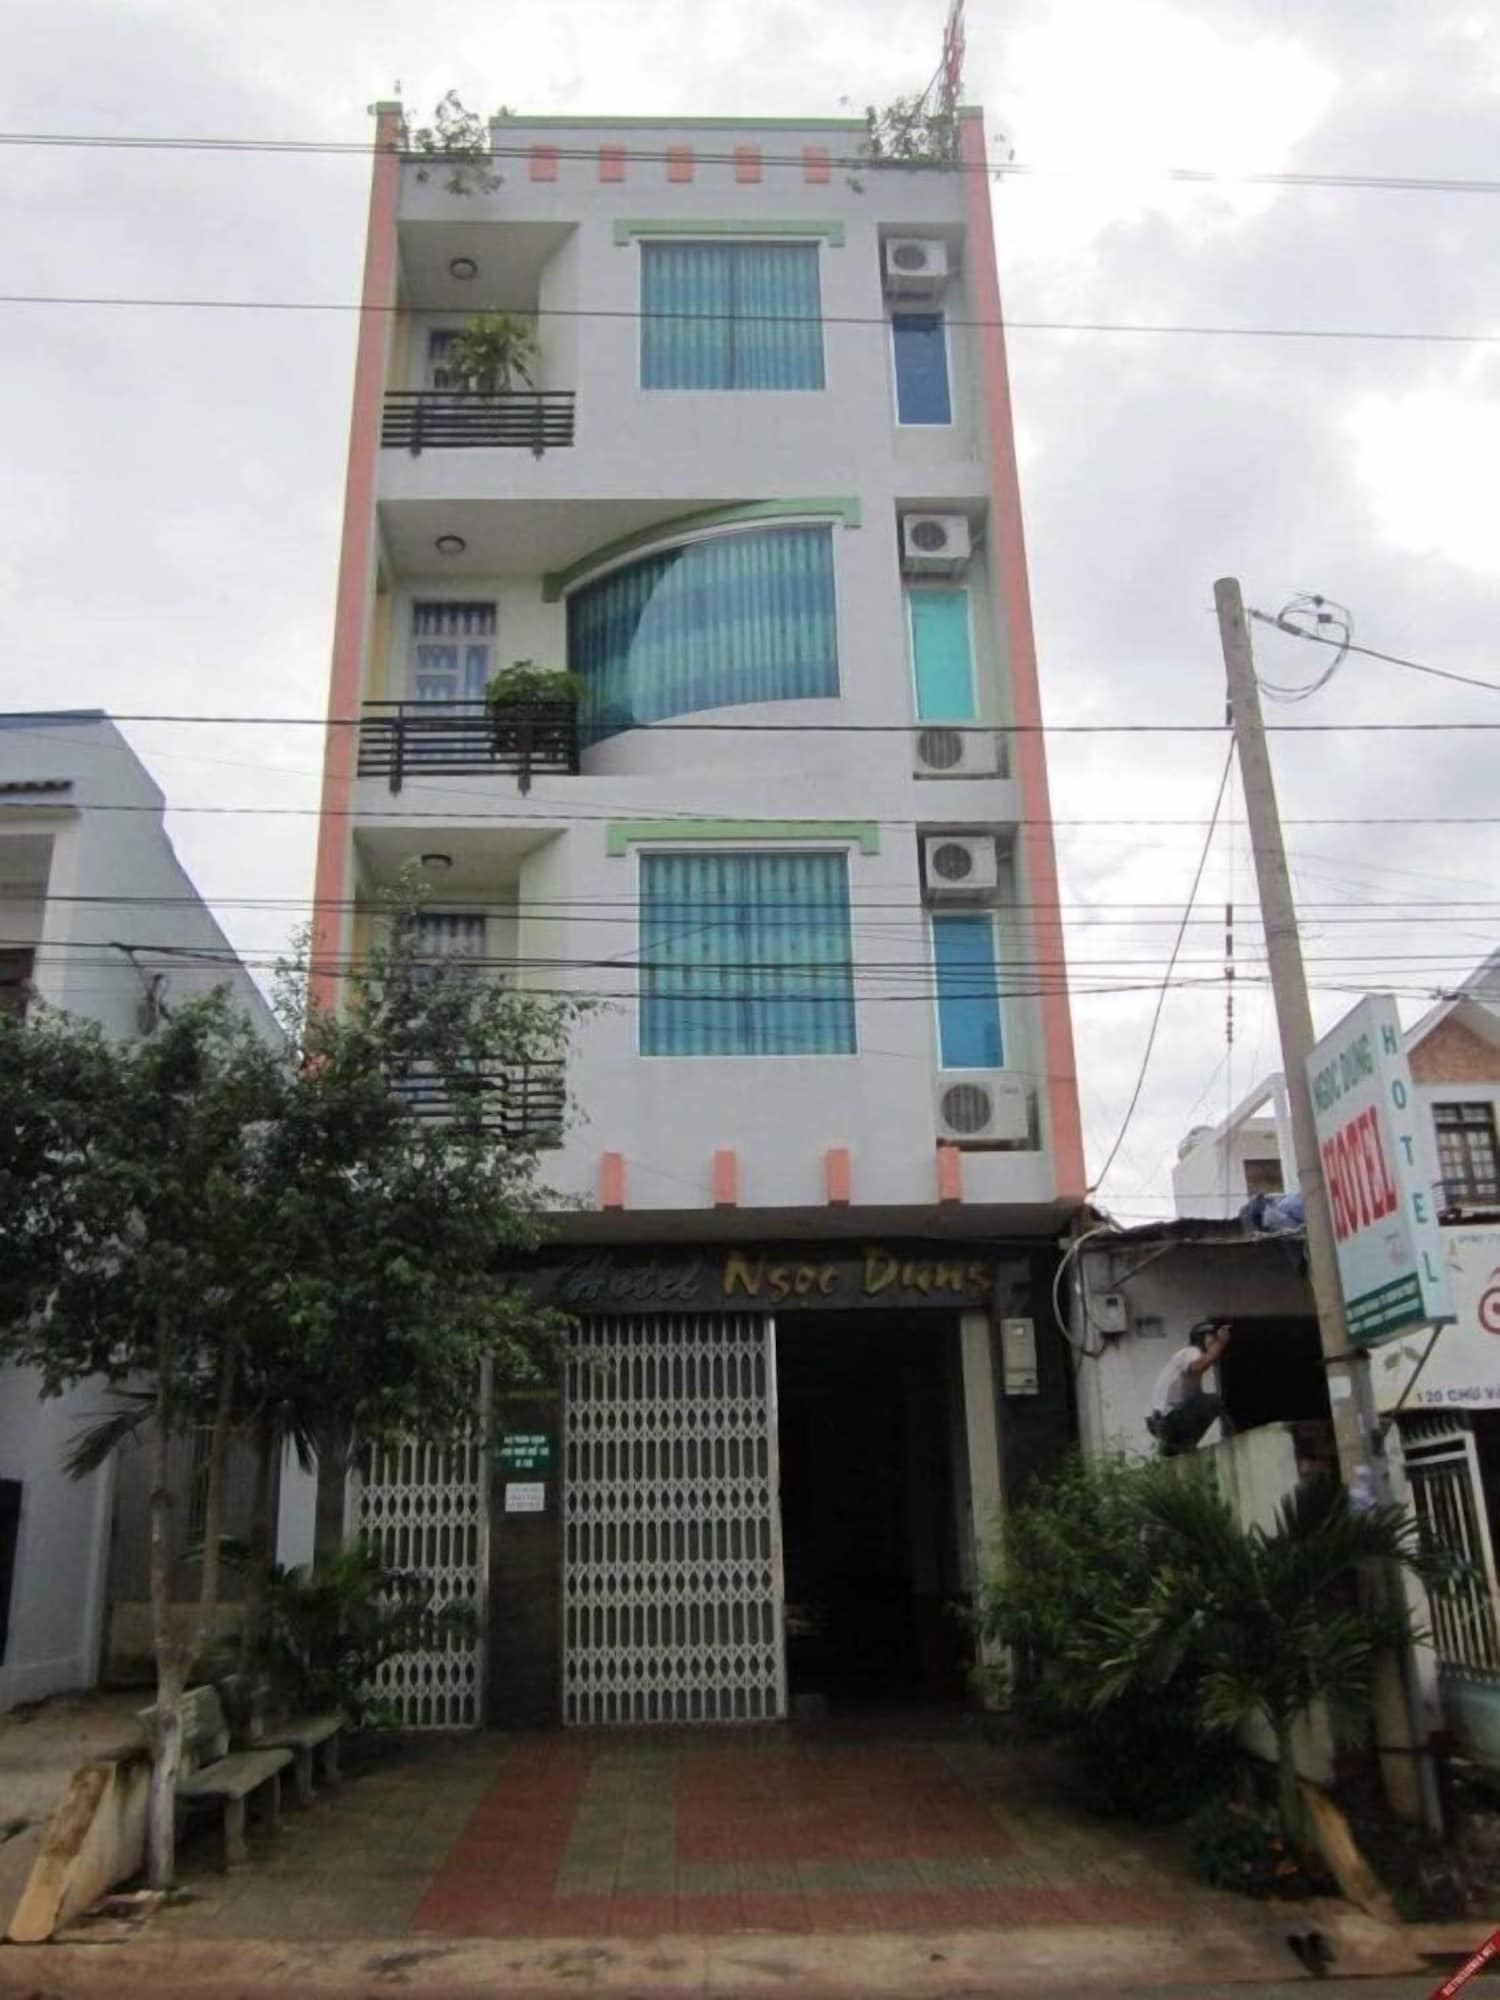 Ngoc Dung Hotel, Buon Ma Thuot